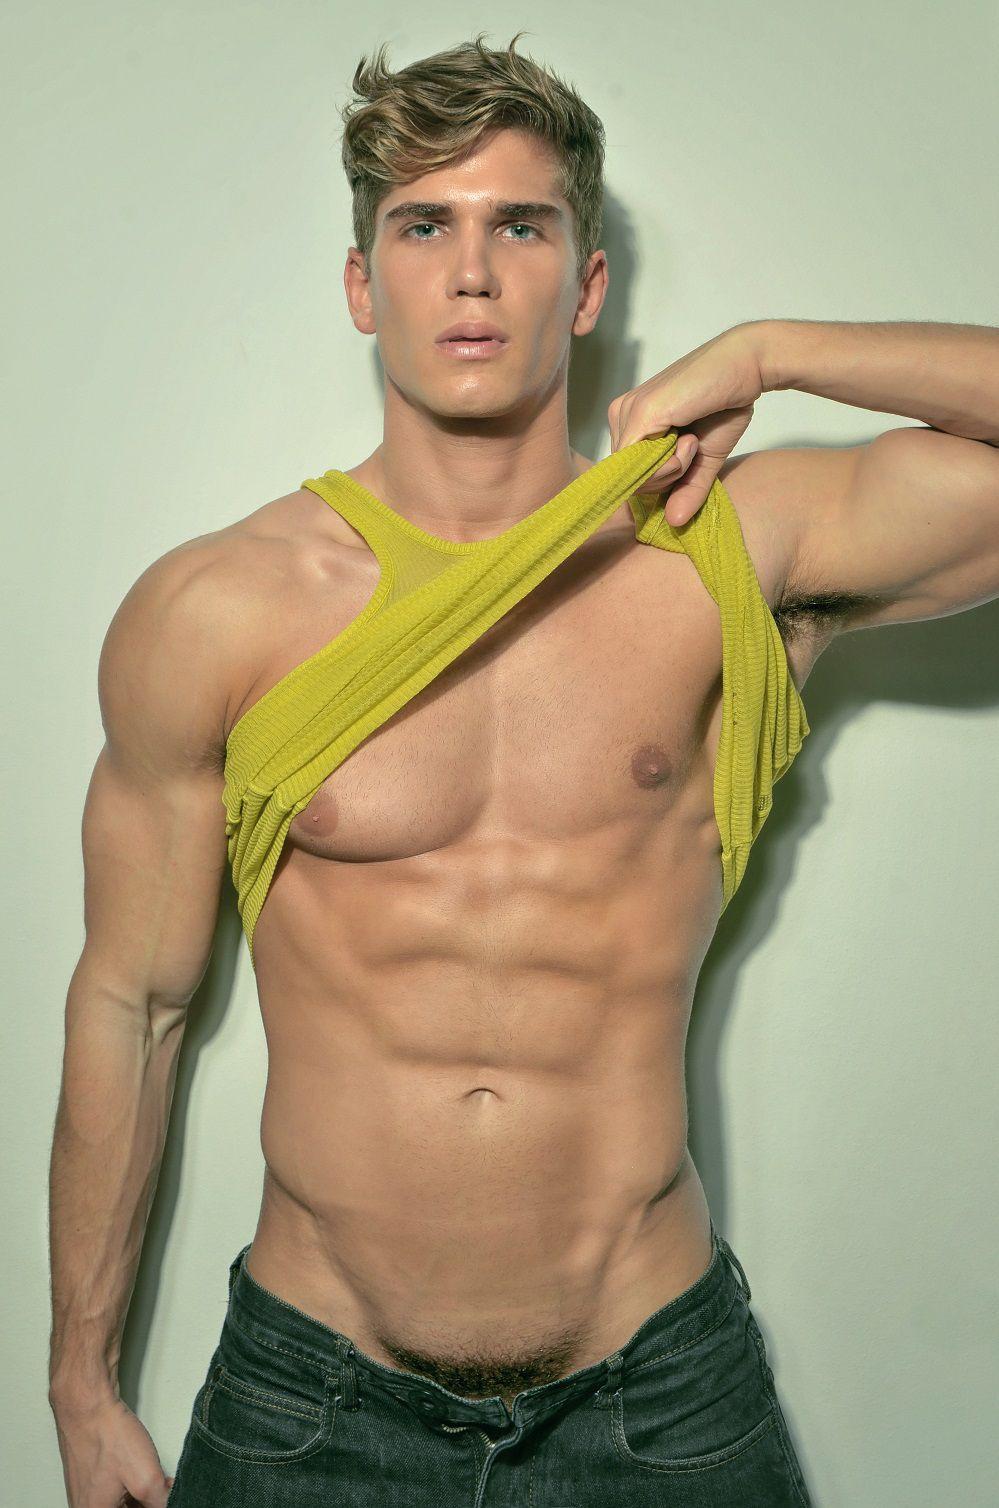 from Skylar naked males posing in mirror